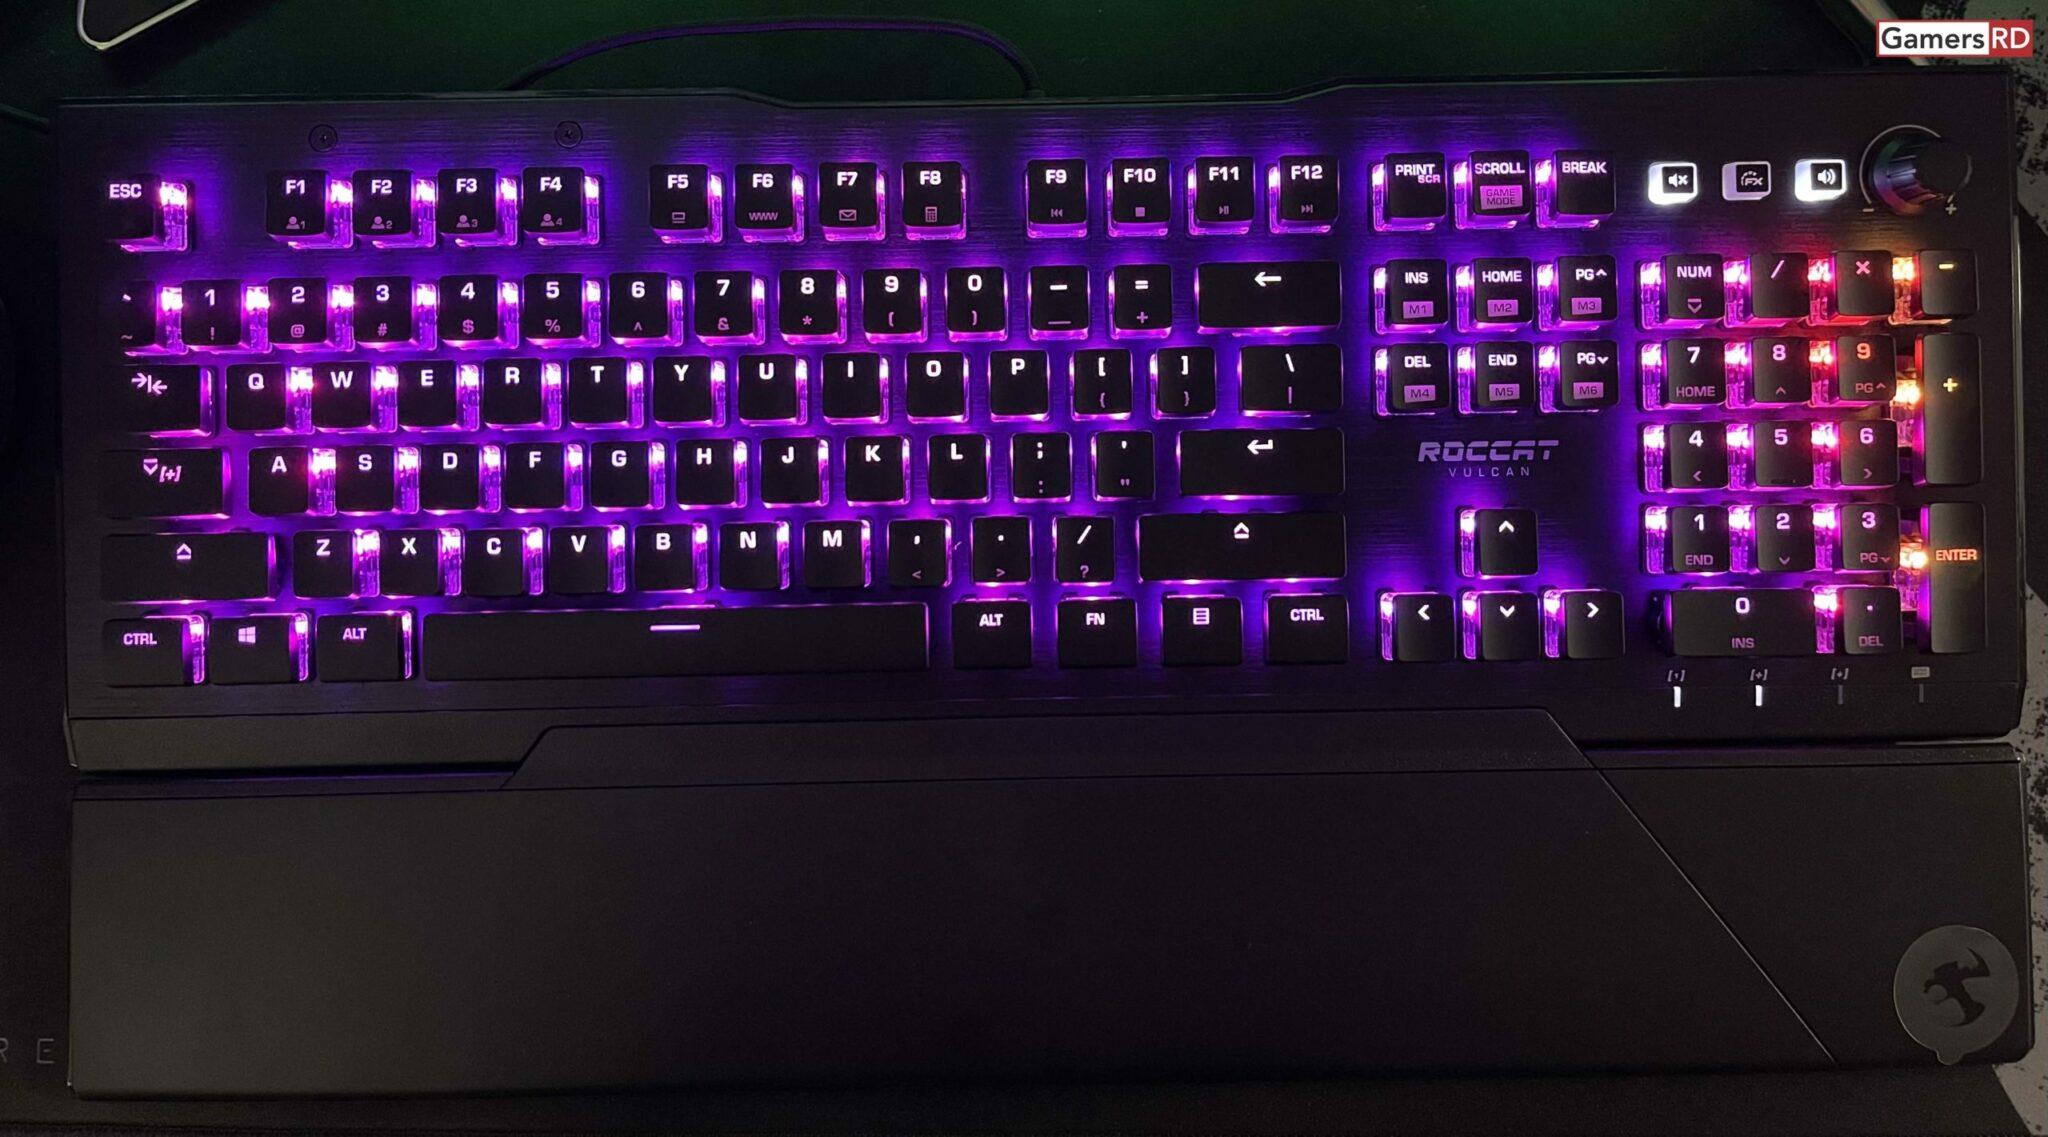 ROCCAT Vulcan Pro Optical-Tactile RGB Gaming Keyboard Review, 7 GamersRD